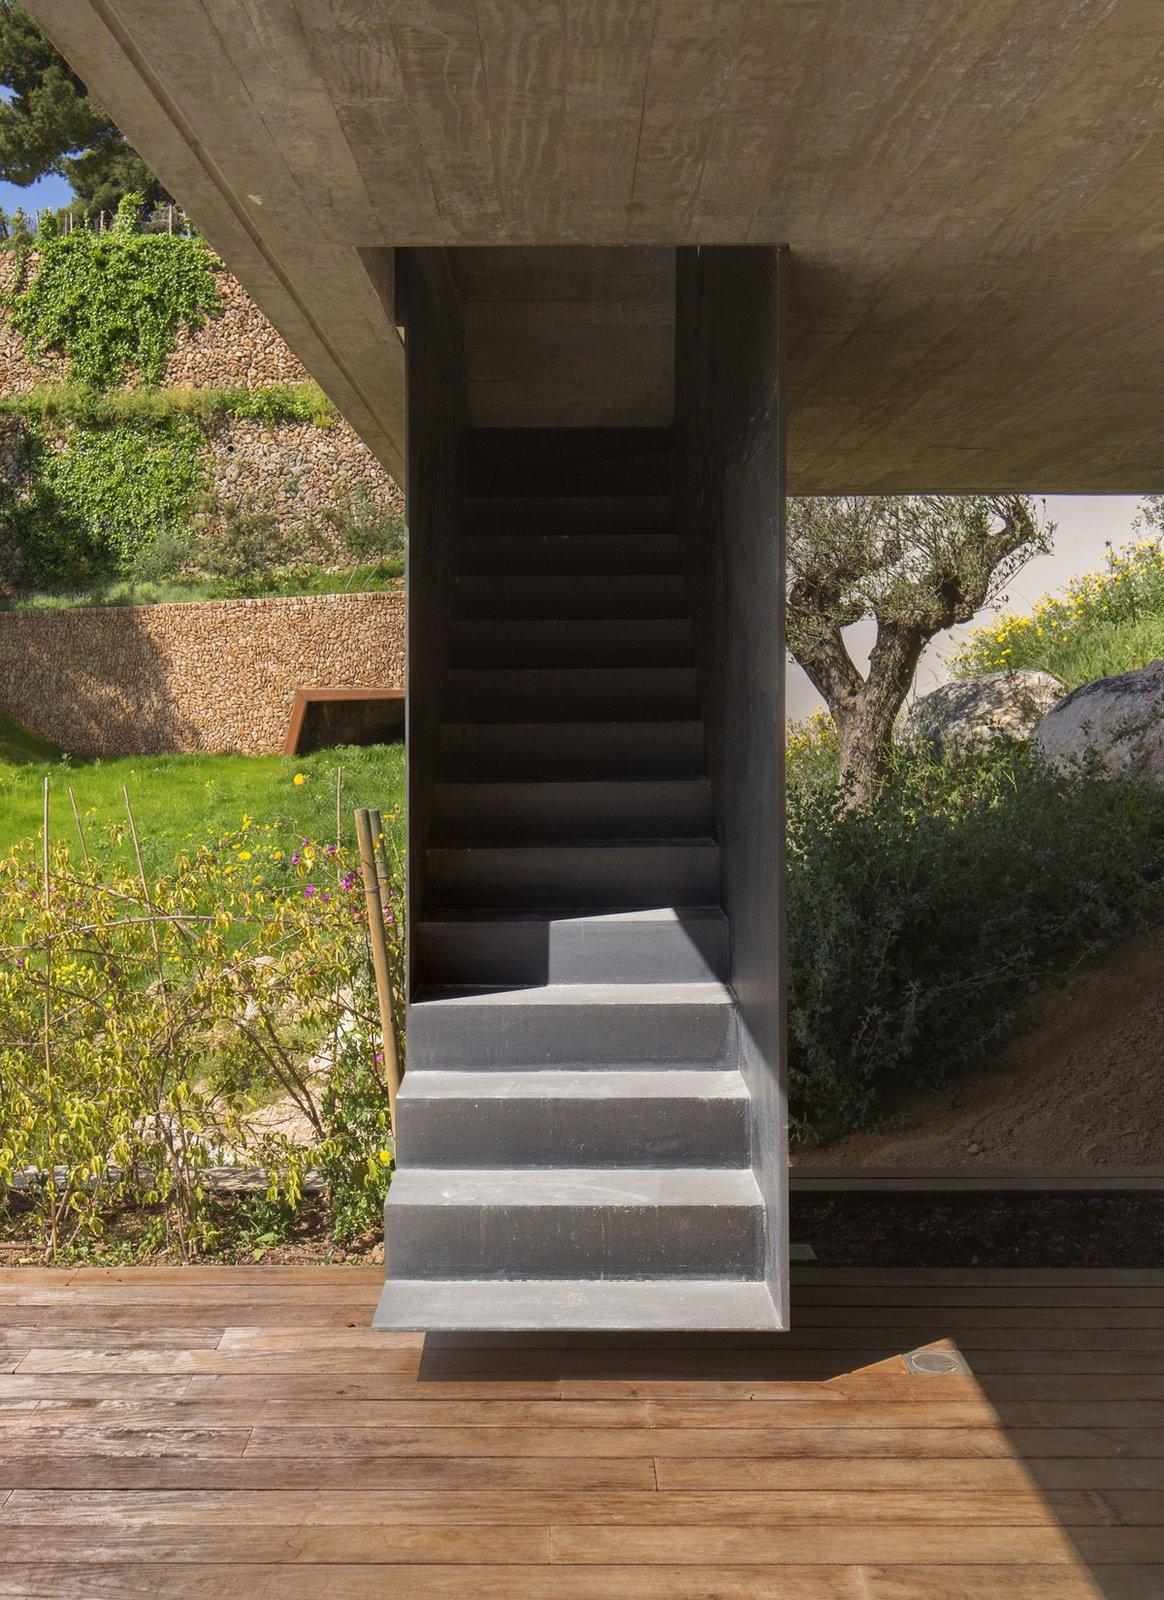 Outdoor, Wood, Side Yard, Large, Grass, Landscape, Metal, and Concrete  Outdoor Side Yard Concrete Wood Photos from Villa Boscana